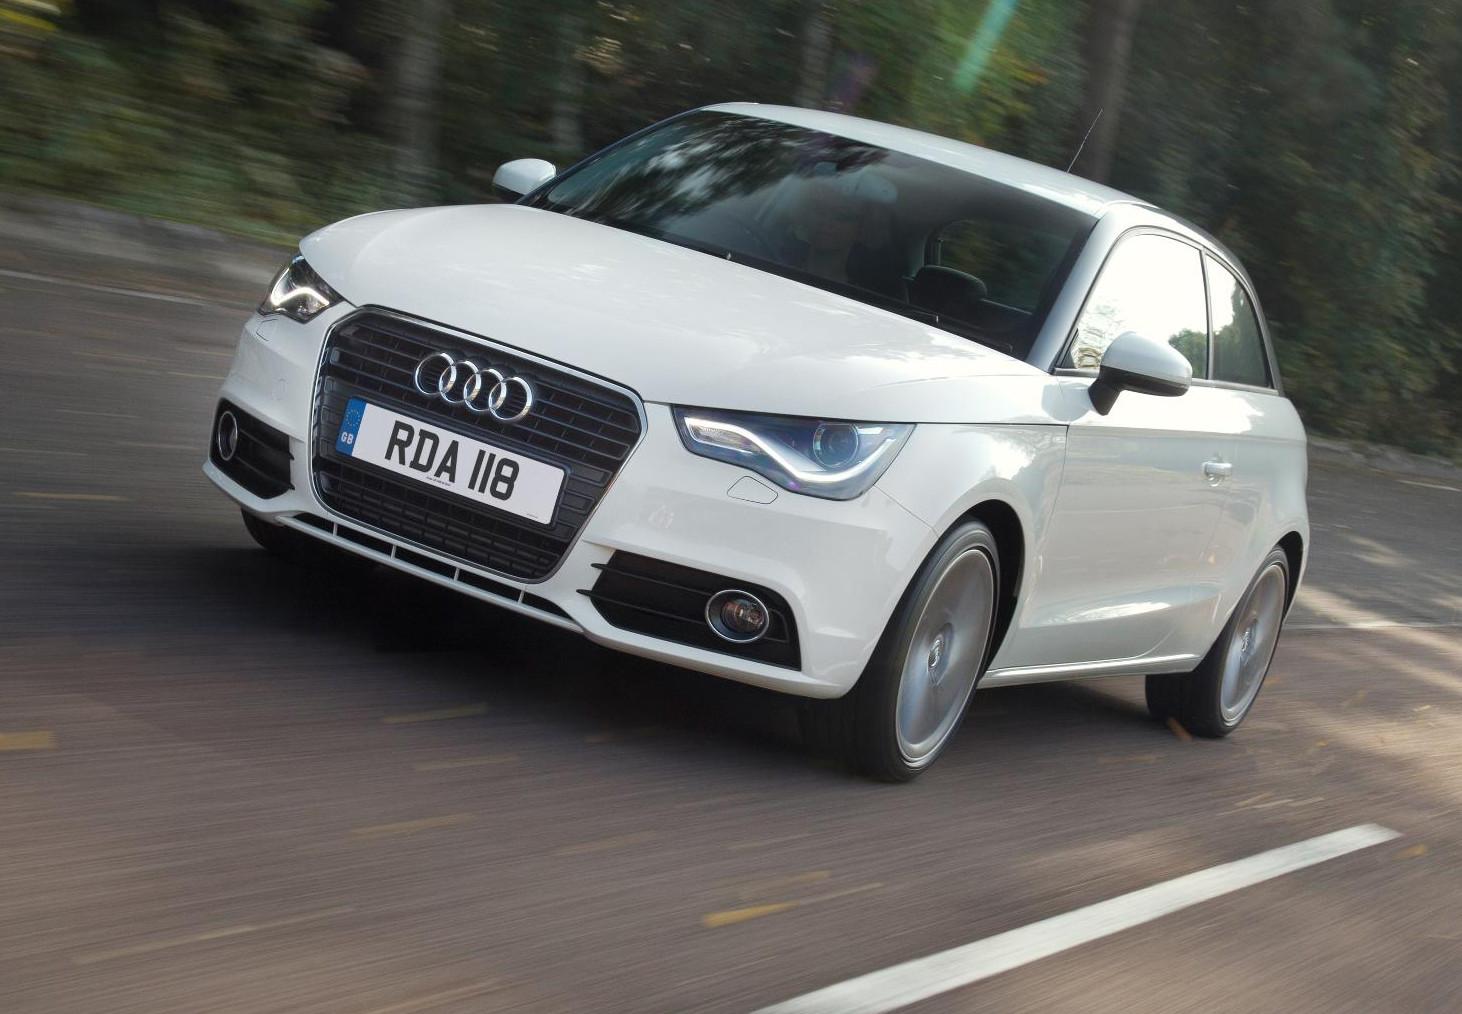 Audi A Named Best Small Car At Fleet World Honours Autoevolution - Audi small car